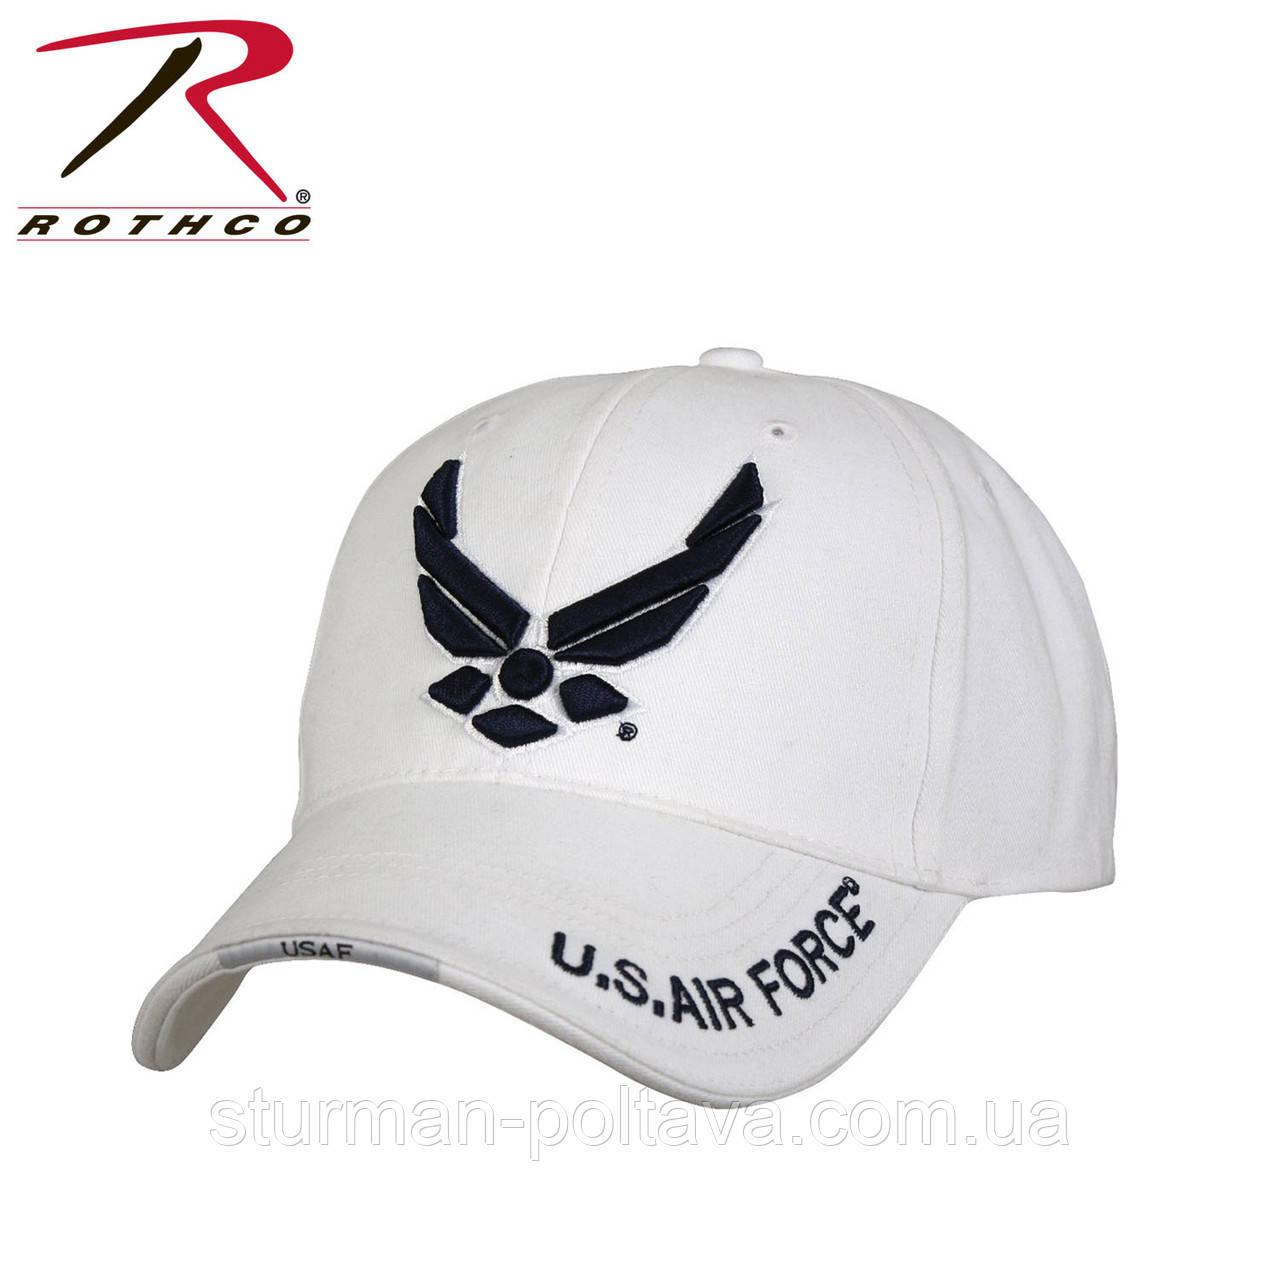 Бейсболка белая ВВС U.S. Air Force Low Profile Cap Rotcho    USA